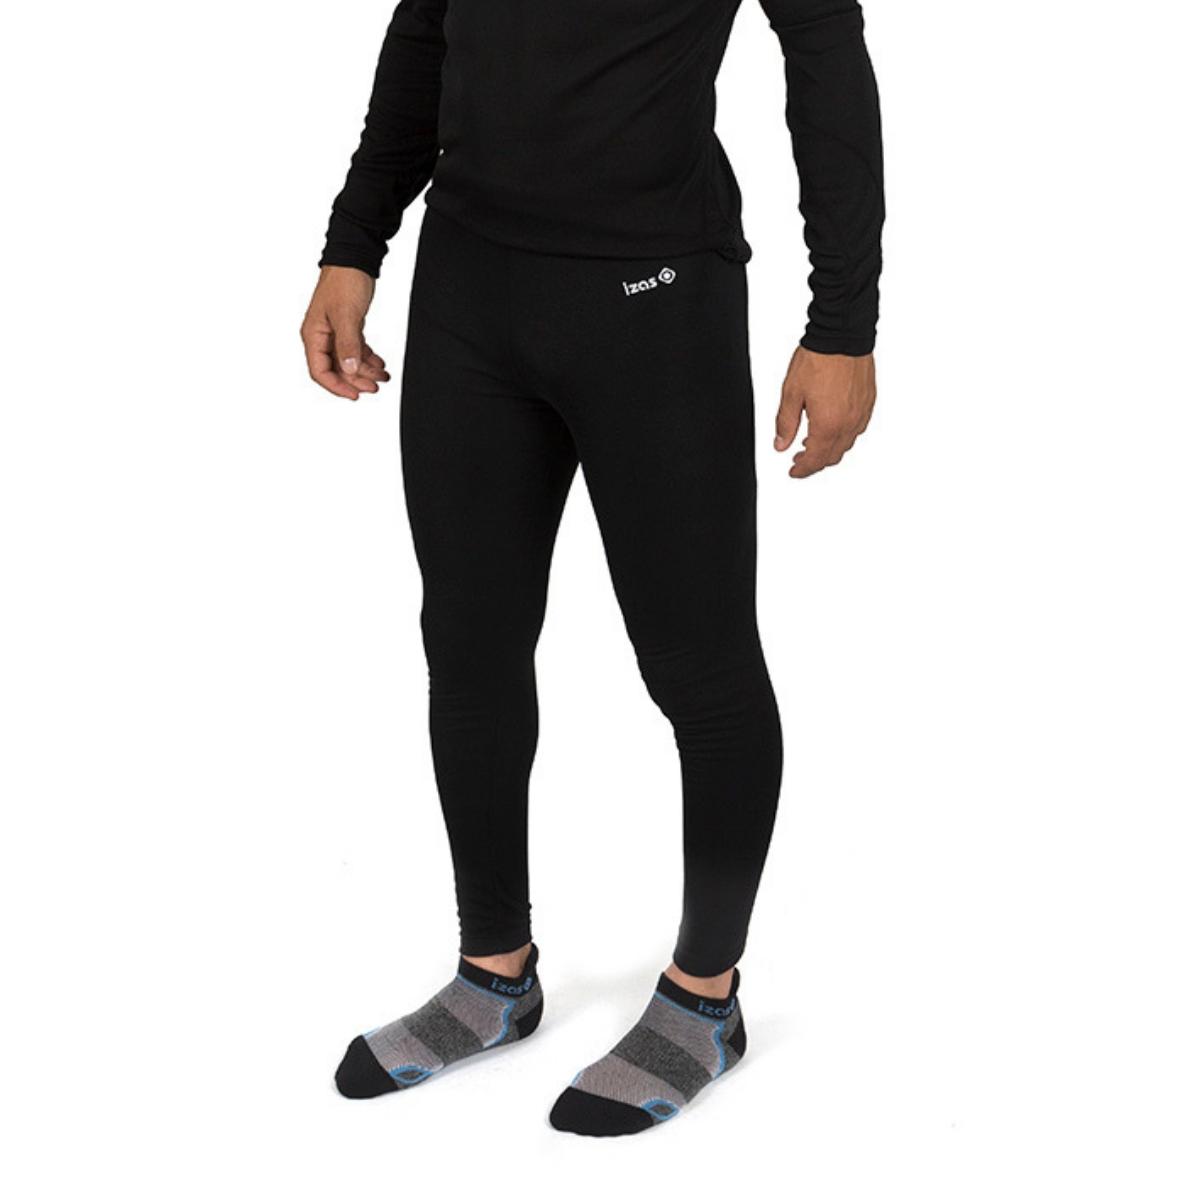 MAN'S MULHACEN THERMAL PANT BLACK